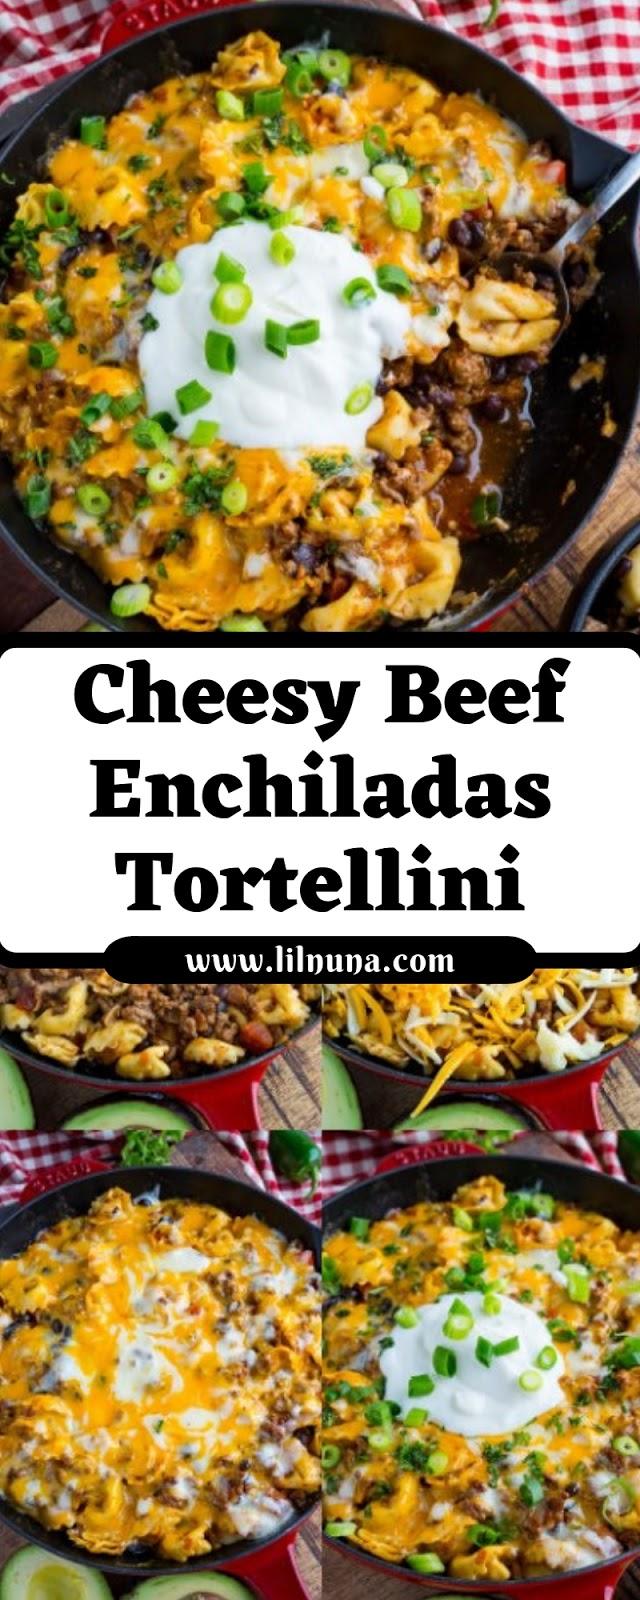 Cheesy Beef Enchiladas Tortellini